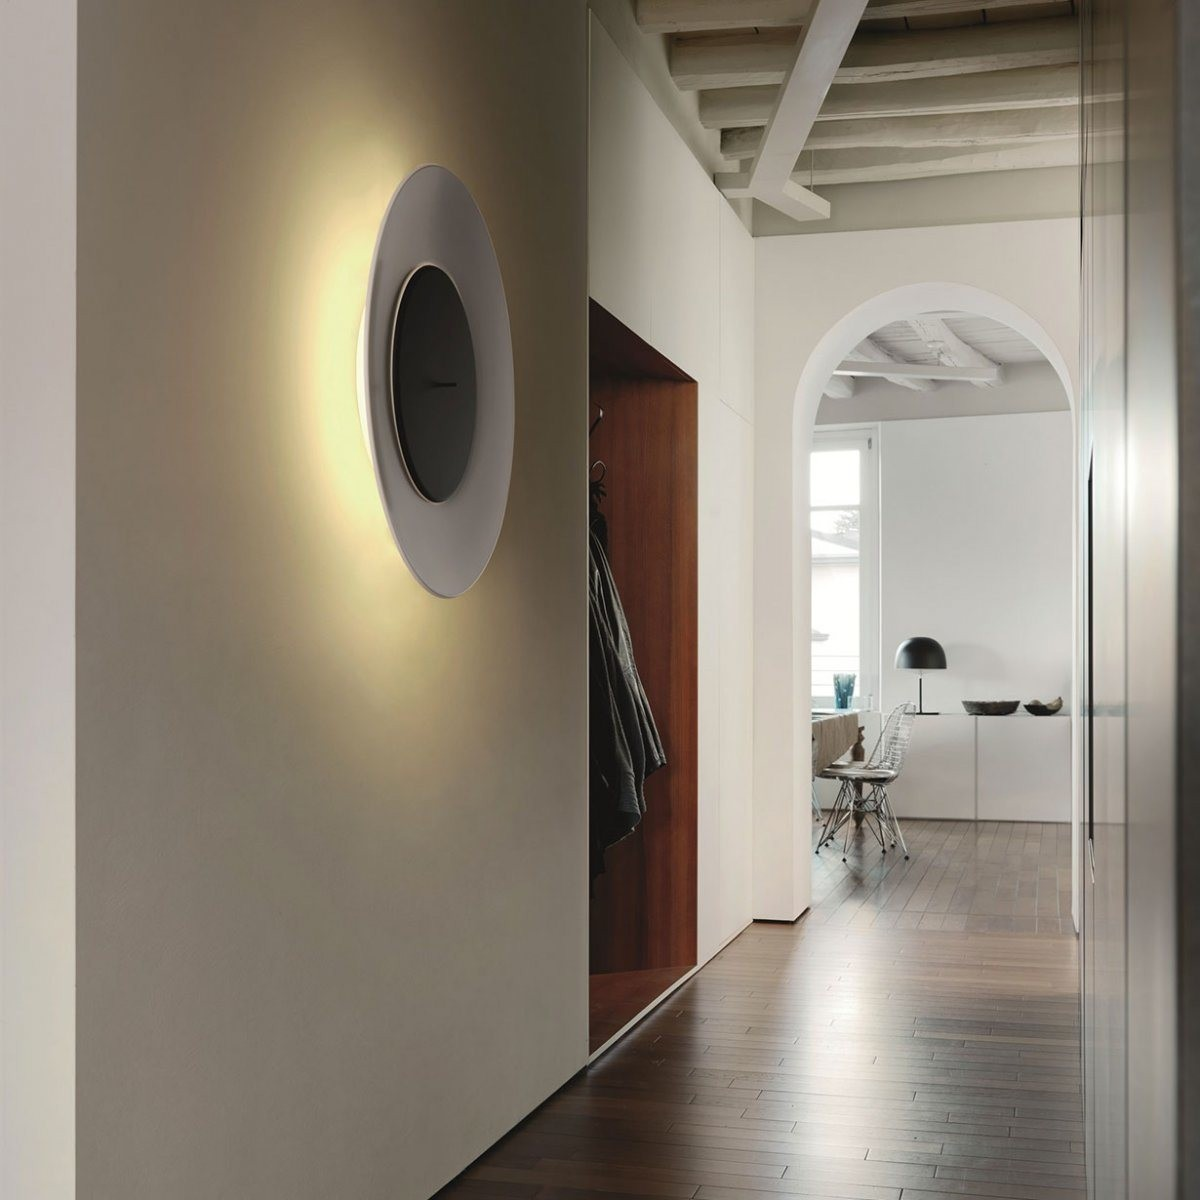 fontanaarte lunaire bianca wall lamp outlet. Black Bedroom Furniture Sets. Home Design Ideas